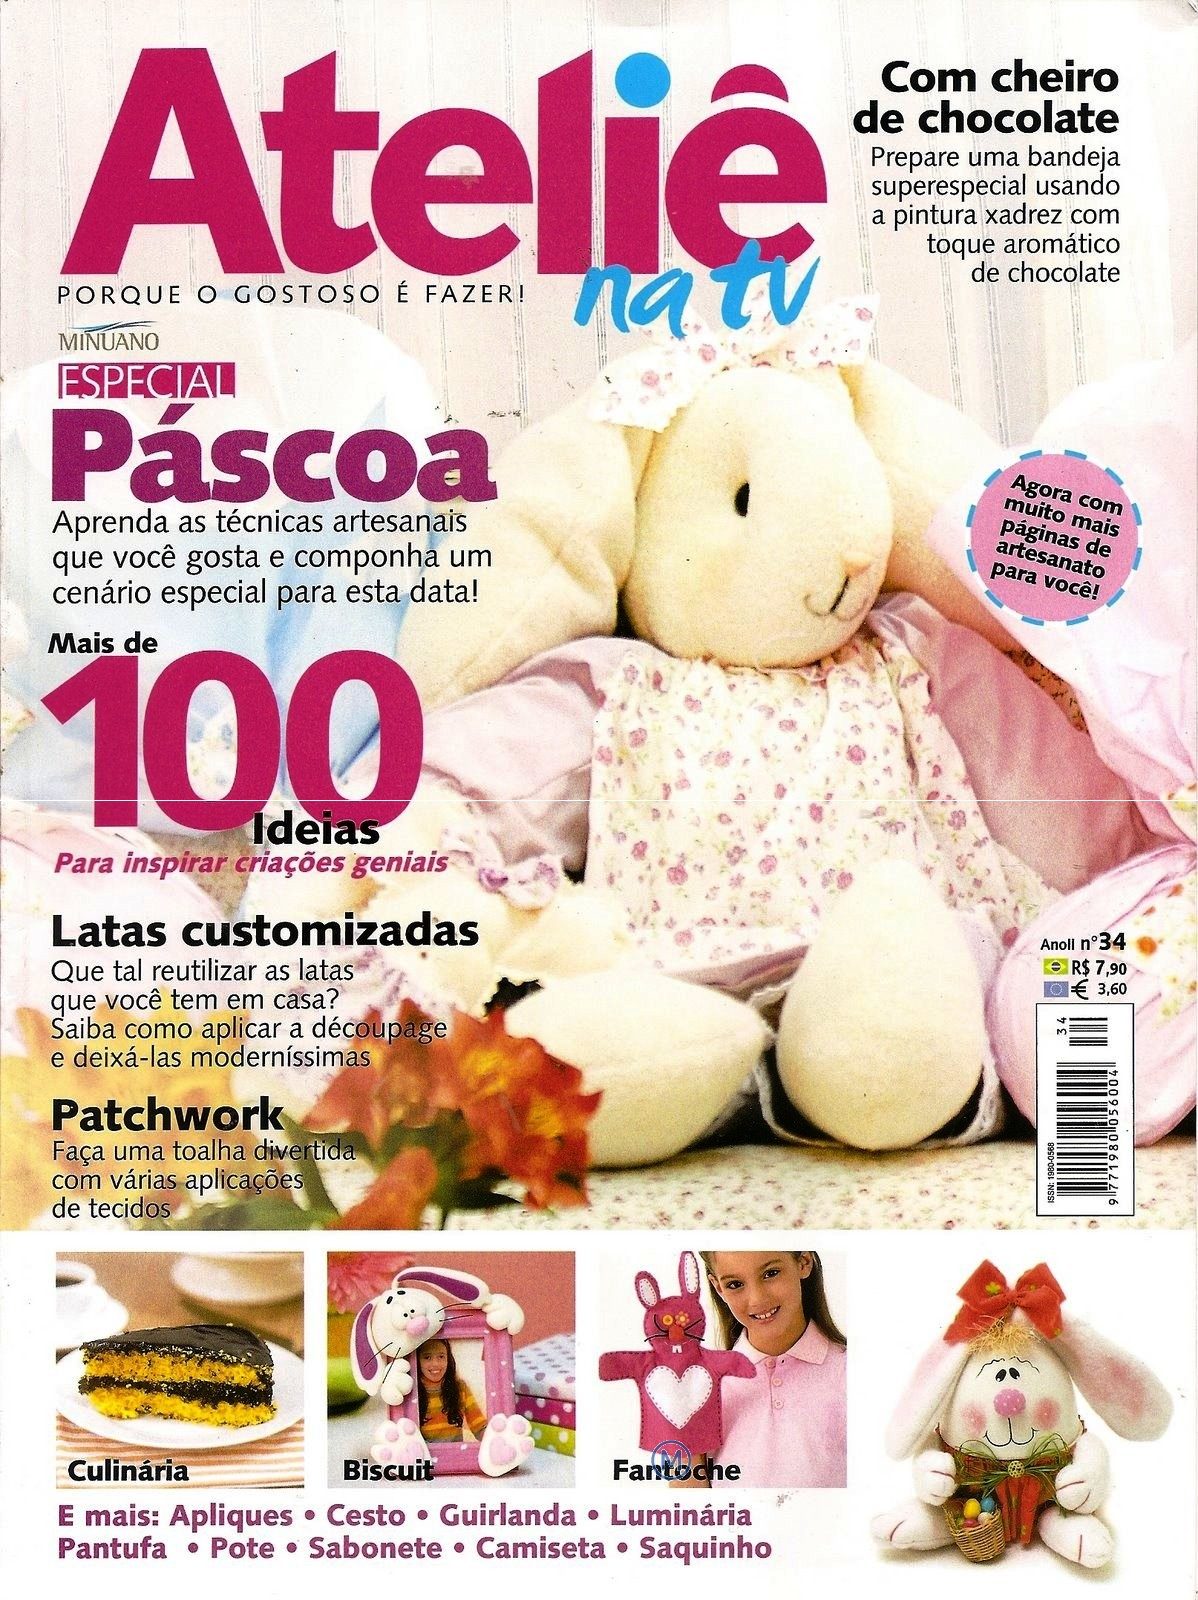 Andrea Artesanato Goiania ~ Mara Artesanato Downloads de Revistas